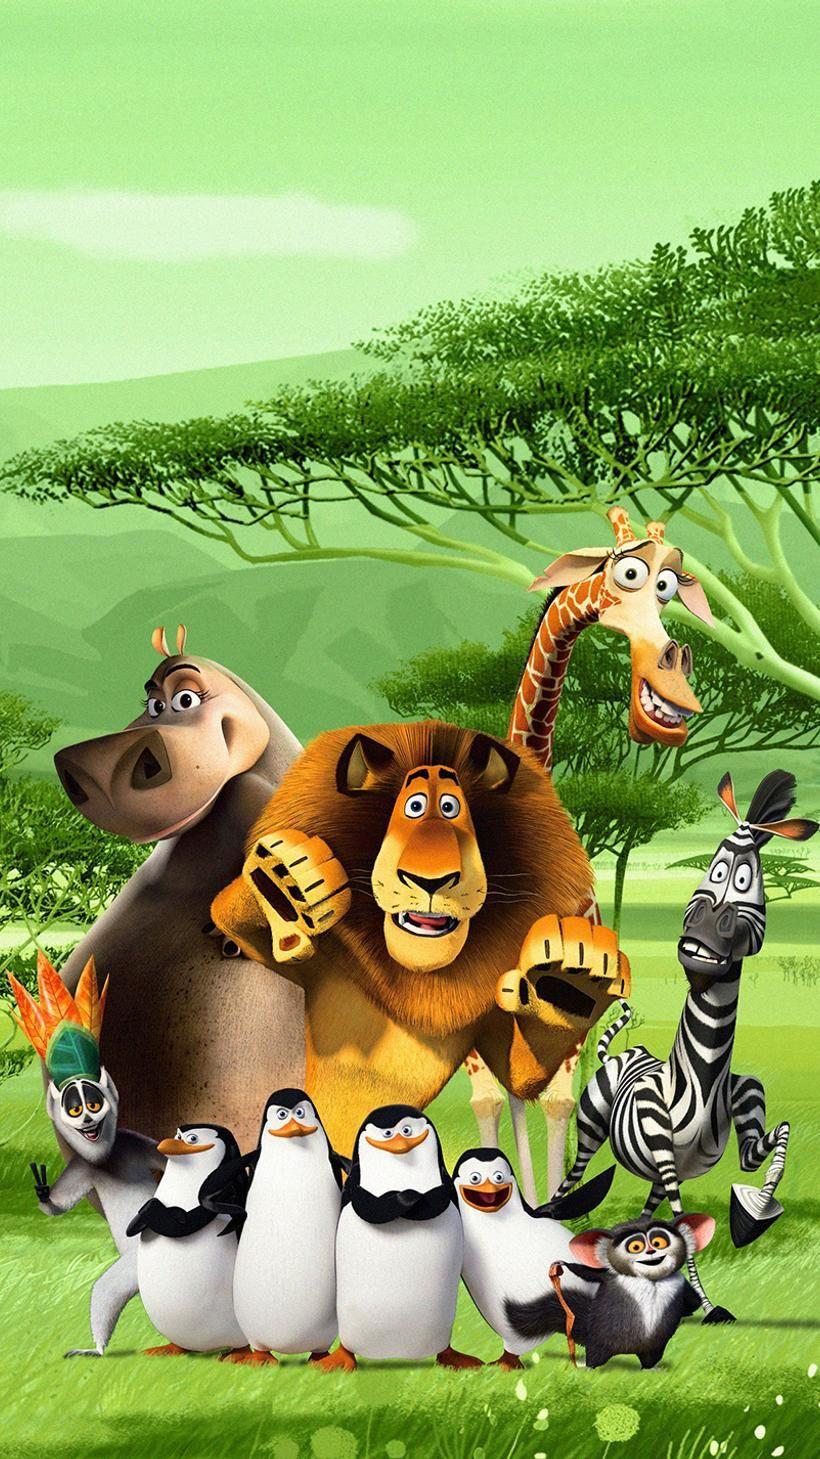 Toy Story 3 (2010) Phone Wallpaper | Moviemania